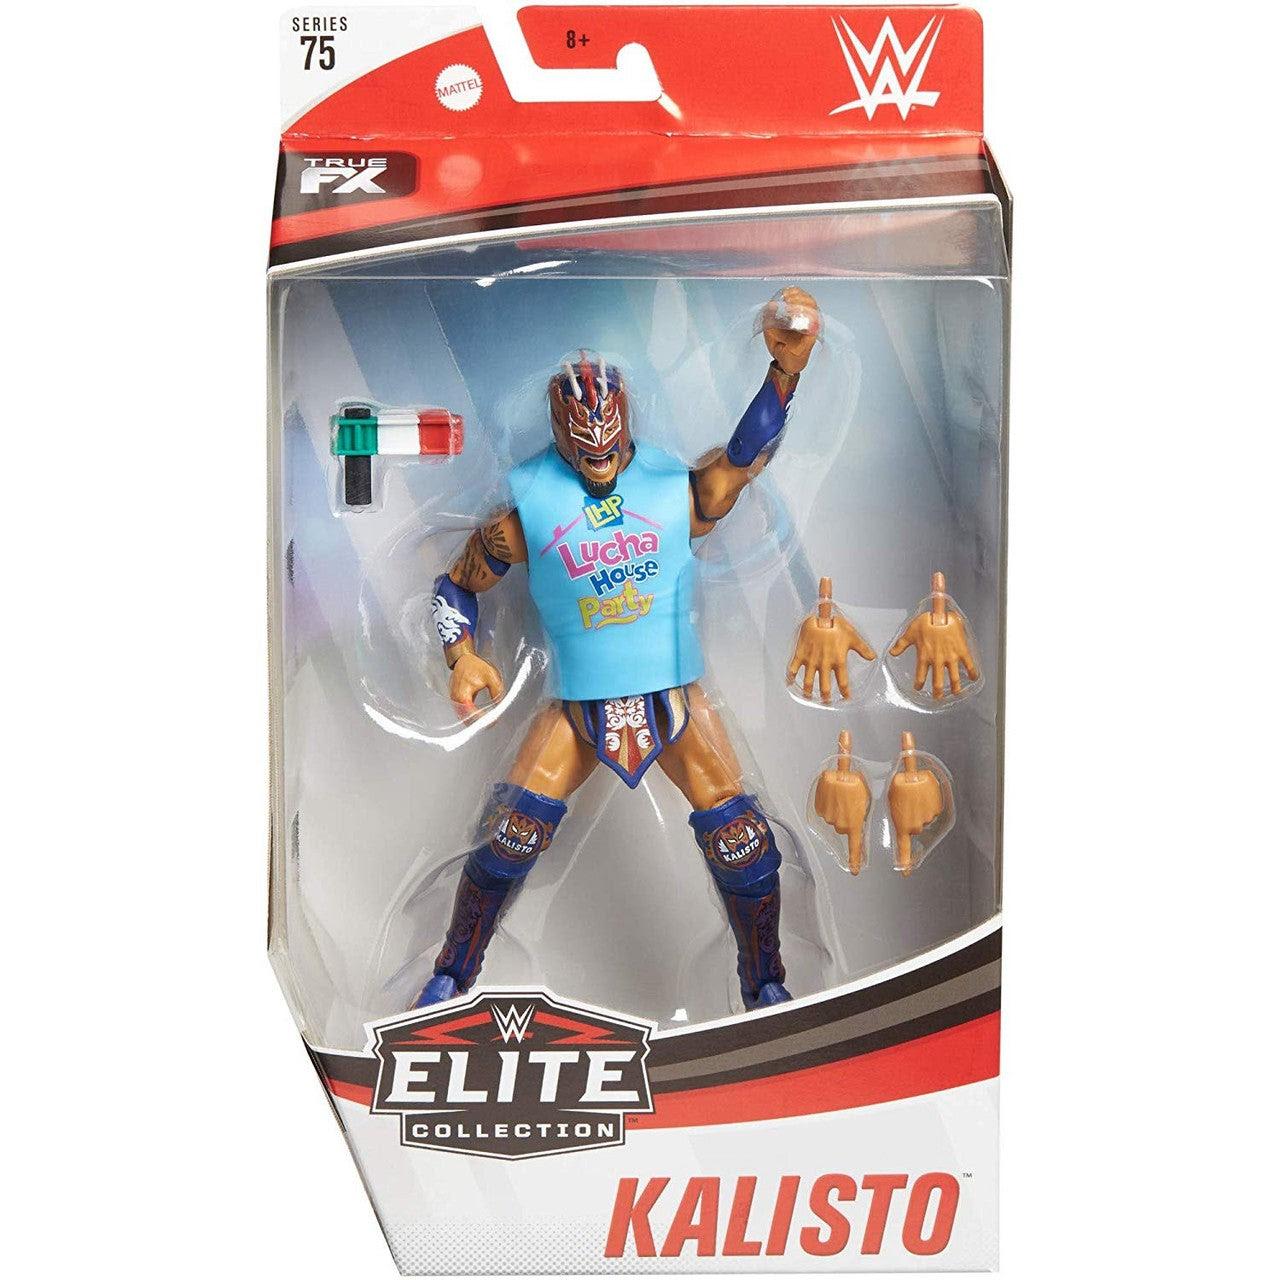 Image of WWE Elite Collection Series 75 - Kalisto